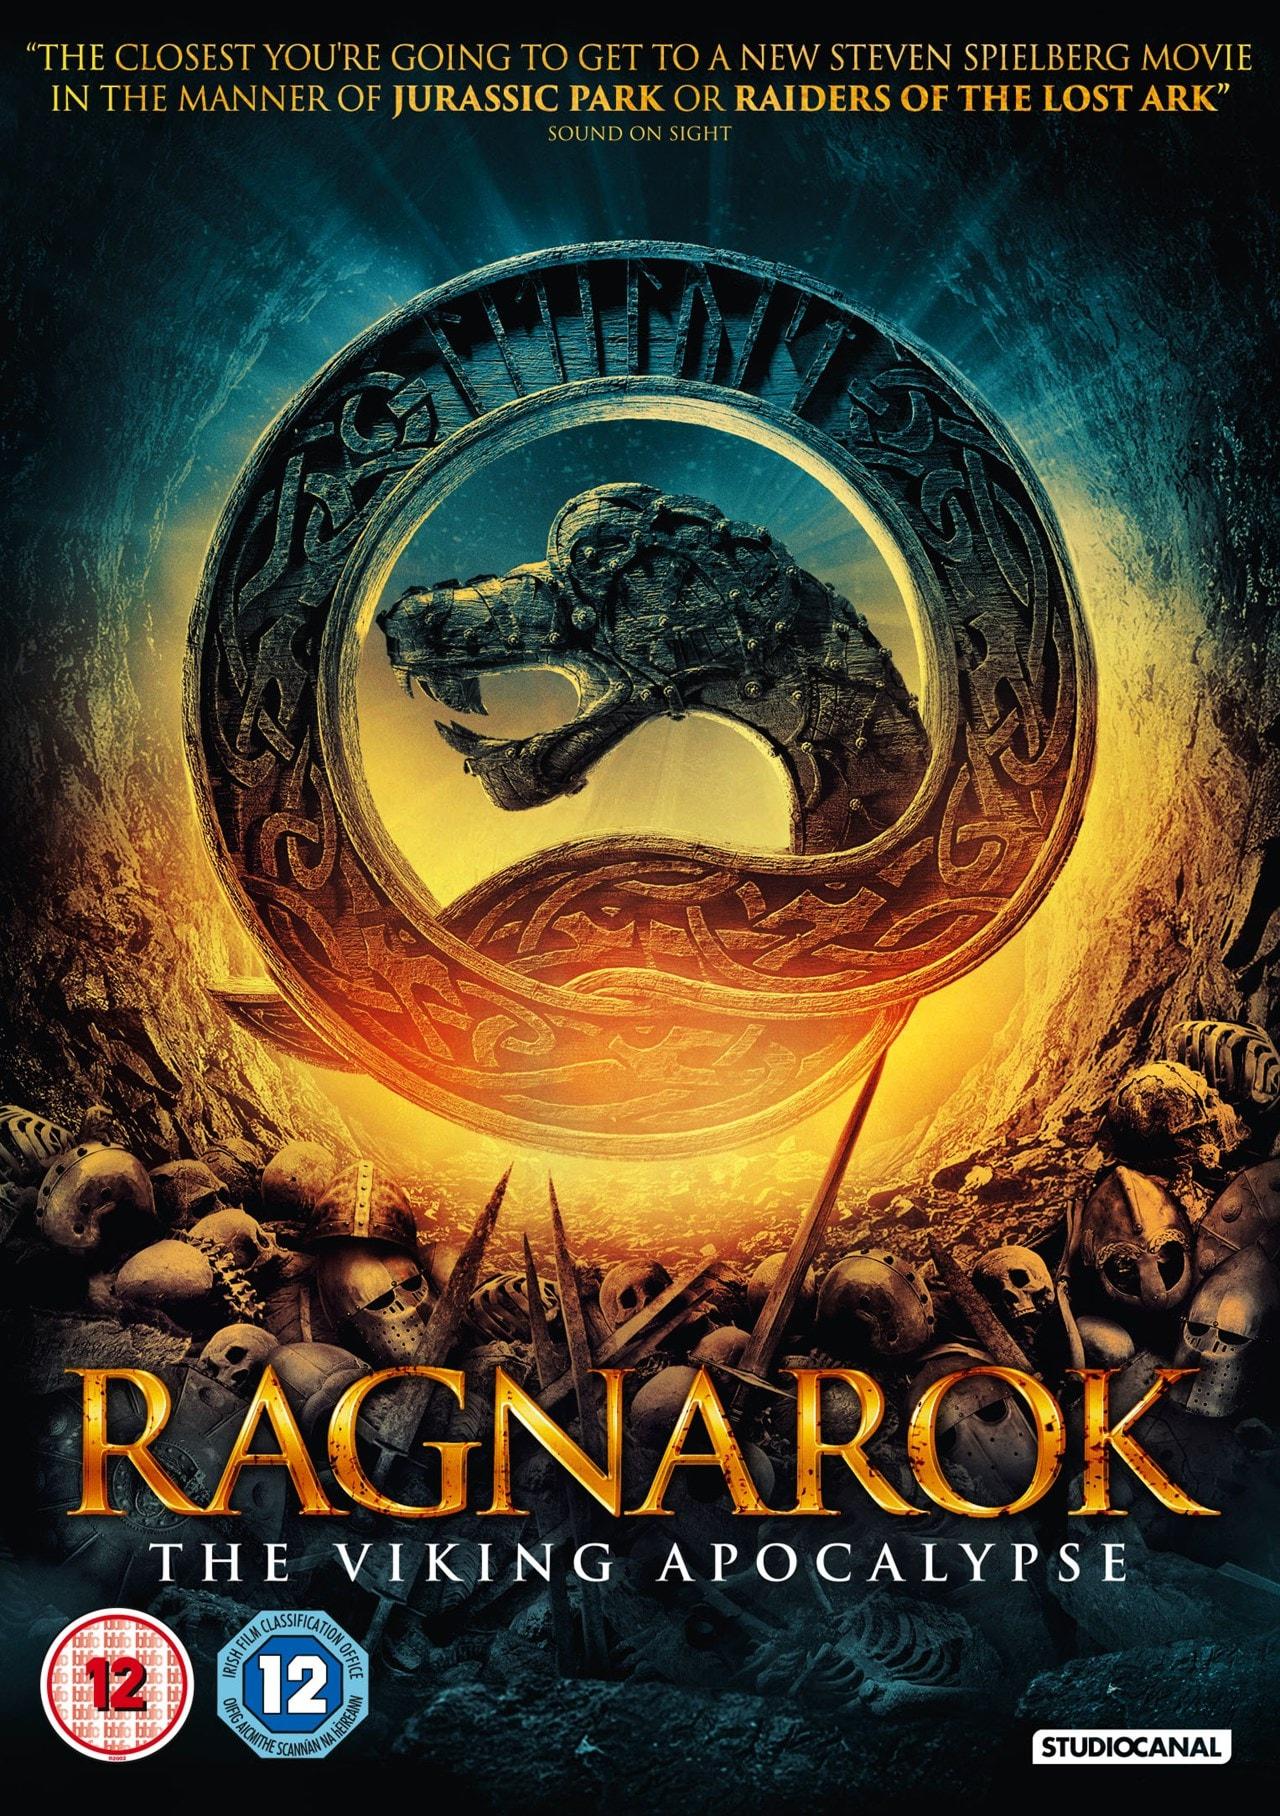 Ragnarok - The Viking Apocalypse - 1